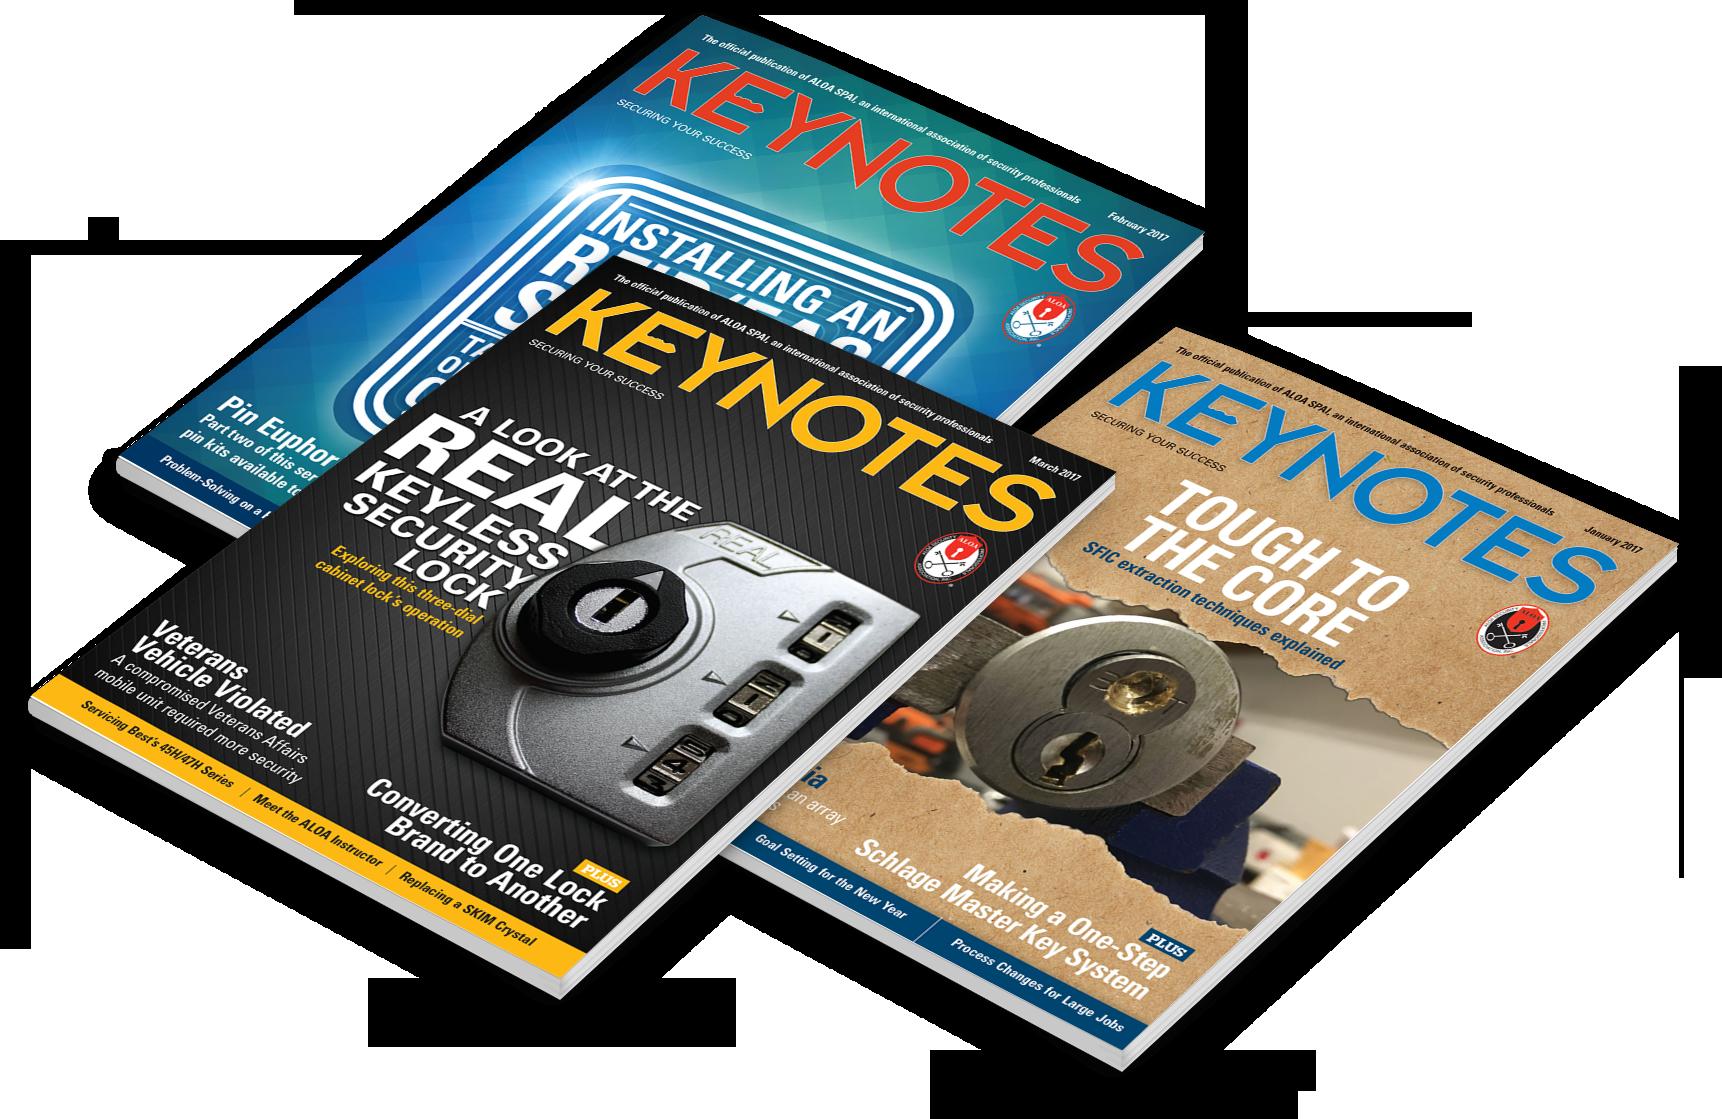 May 2017 Issue of Keynotes